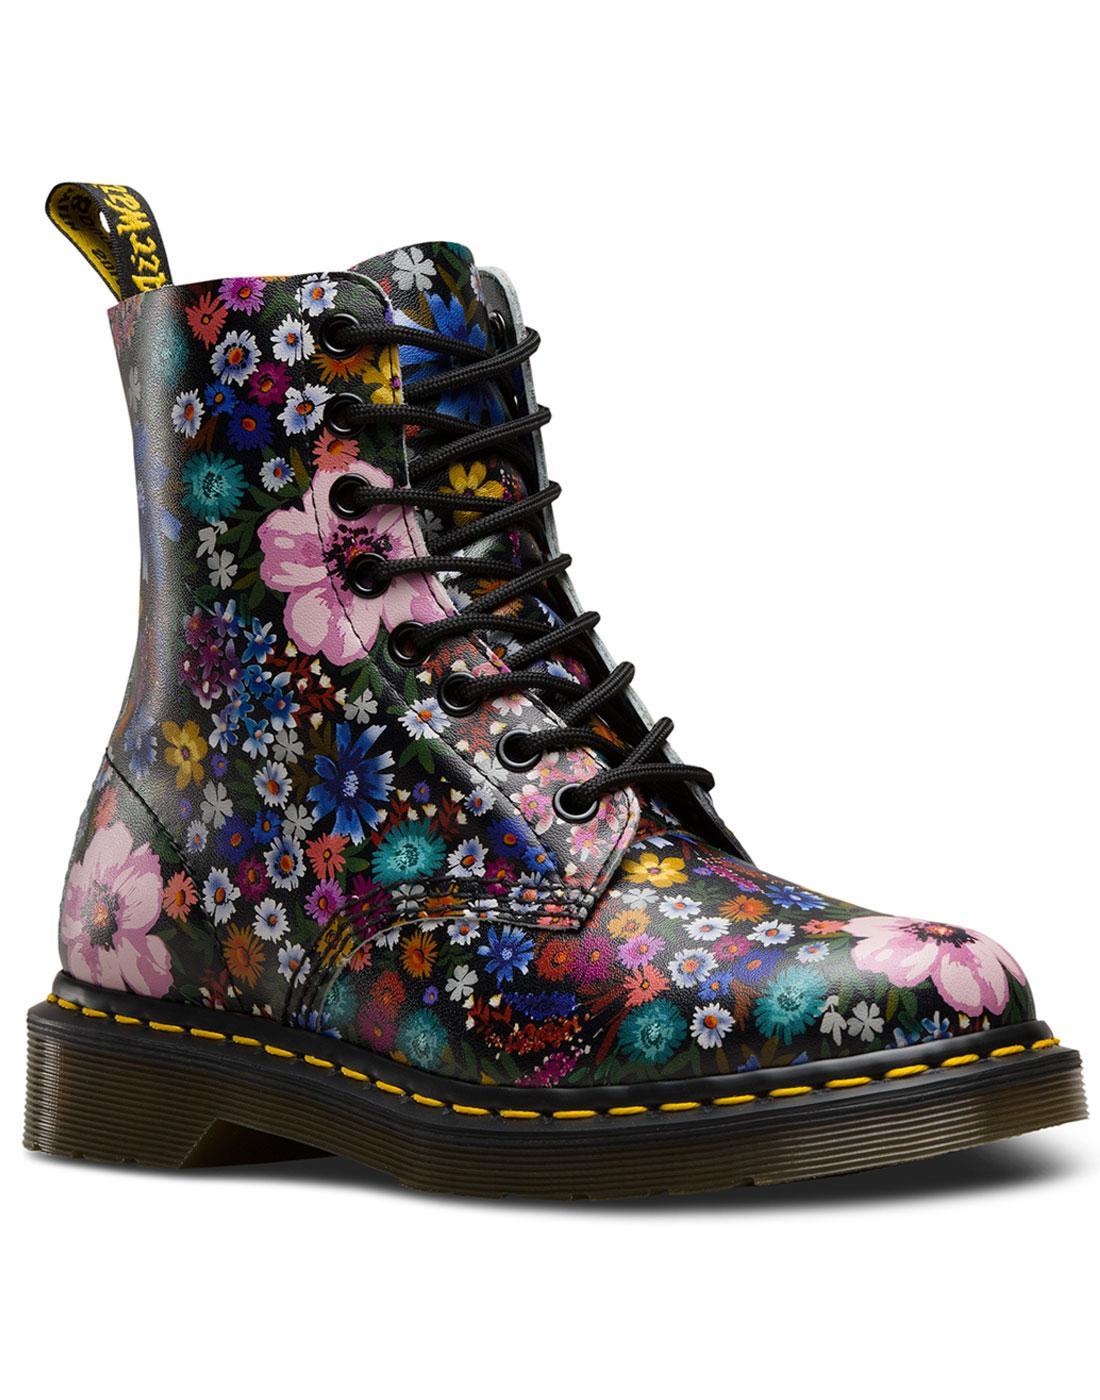 Pascal Wanderlust DR MARTENS Womens Floral Boots B